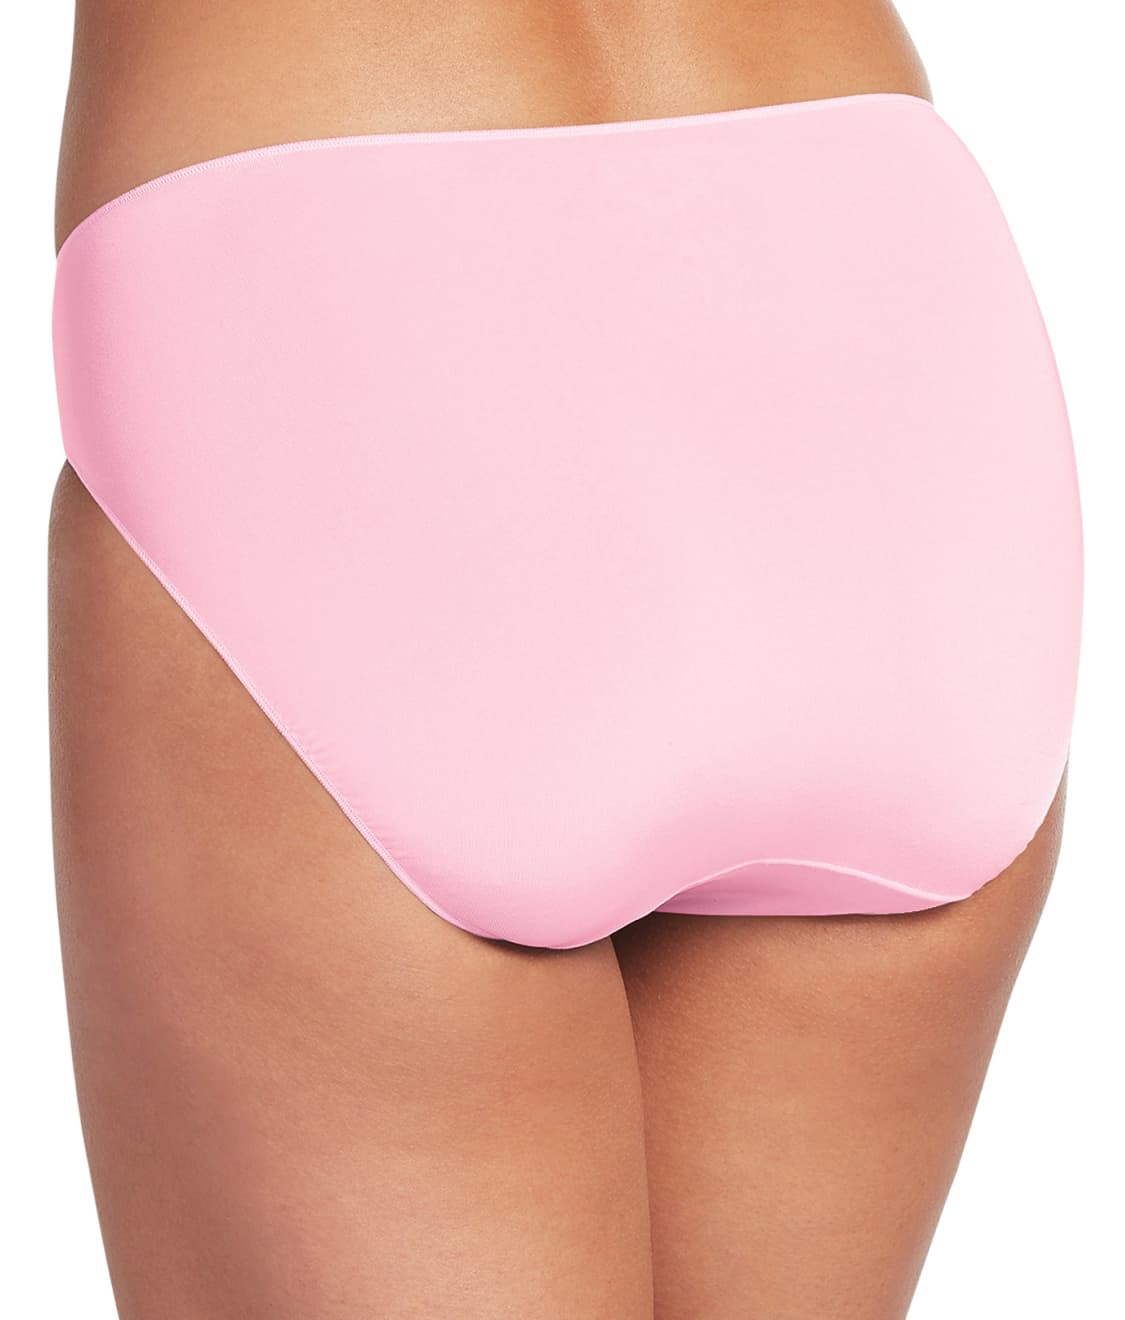 c96ae87c19e9 Jockey No Panty Line Promise Bikini | Bare Necessities (1370)